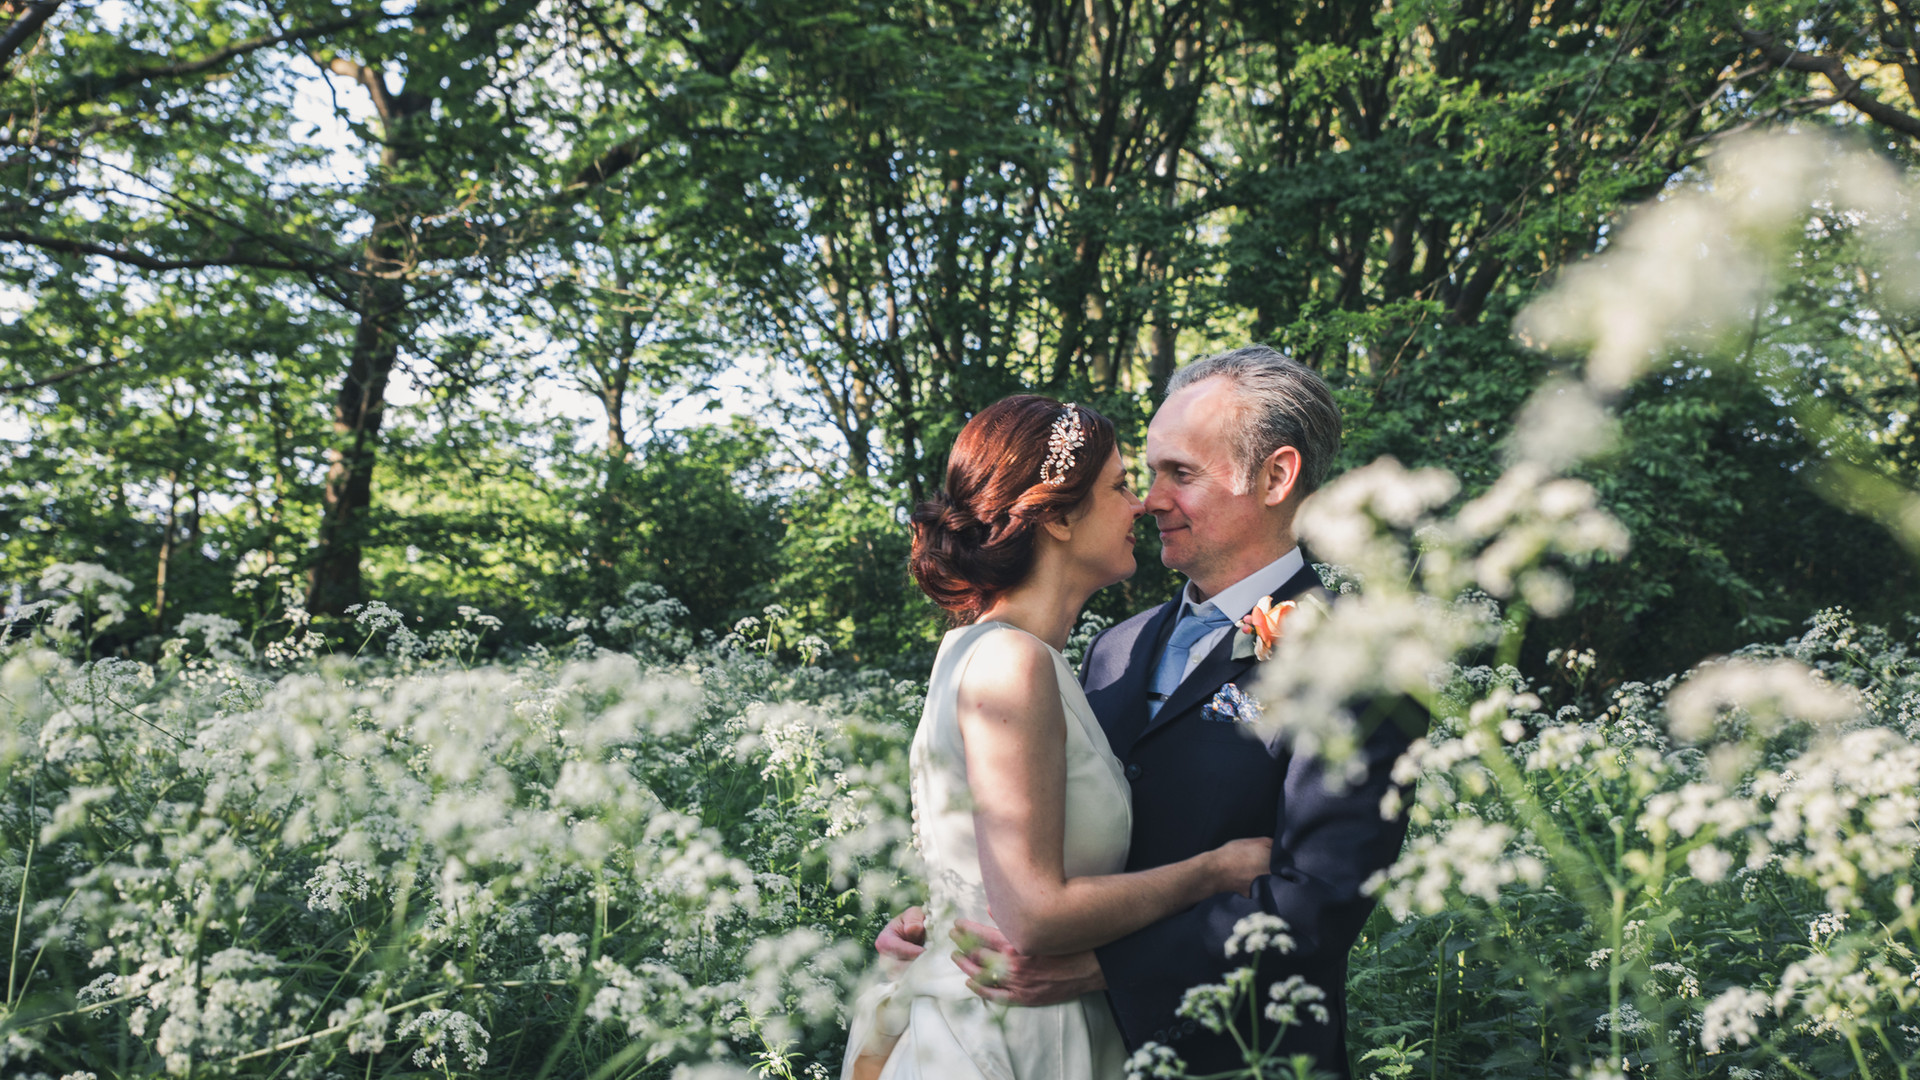 Couple Wedding Portrait in Summer Woodland at Orleans House Gallery, Twickenham